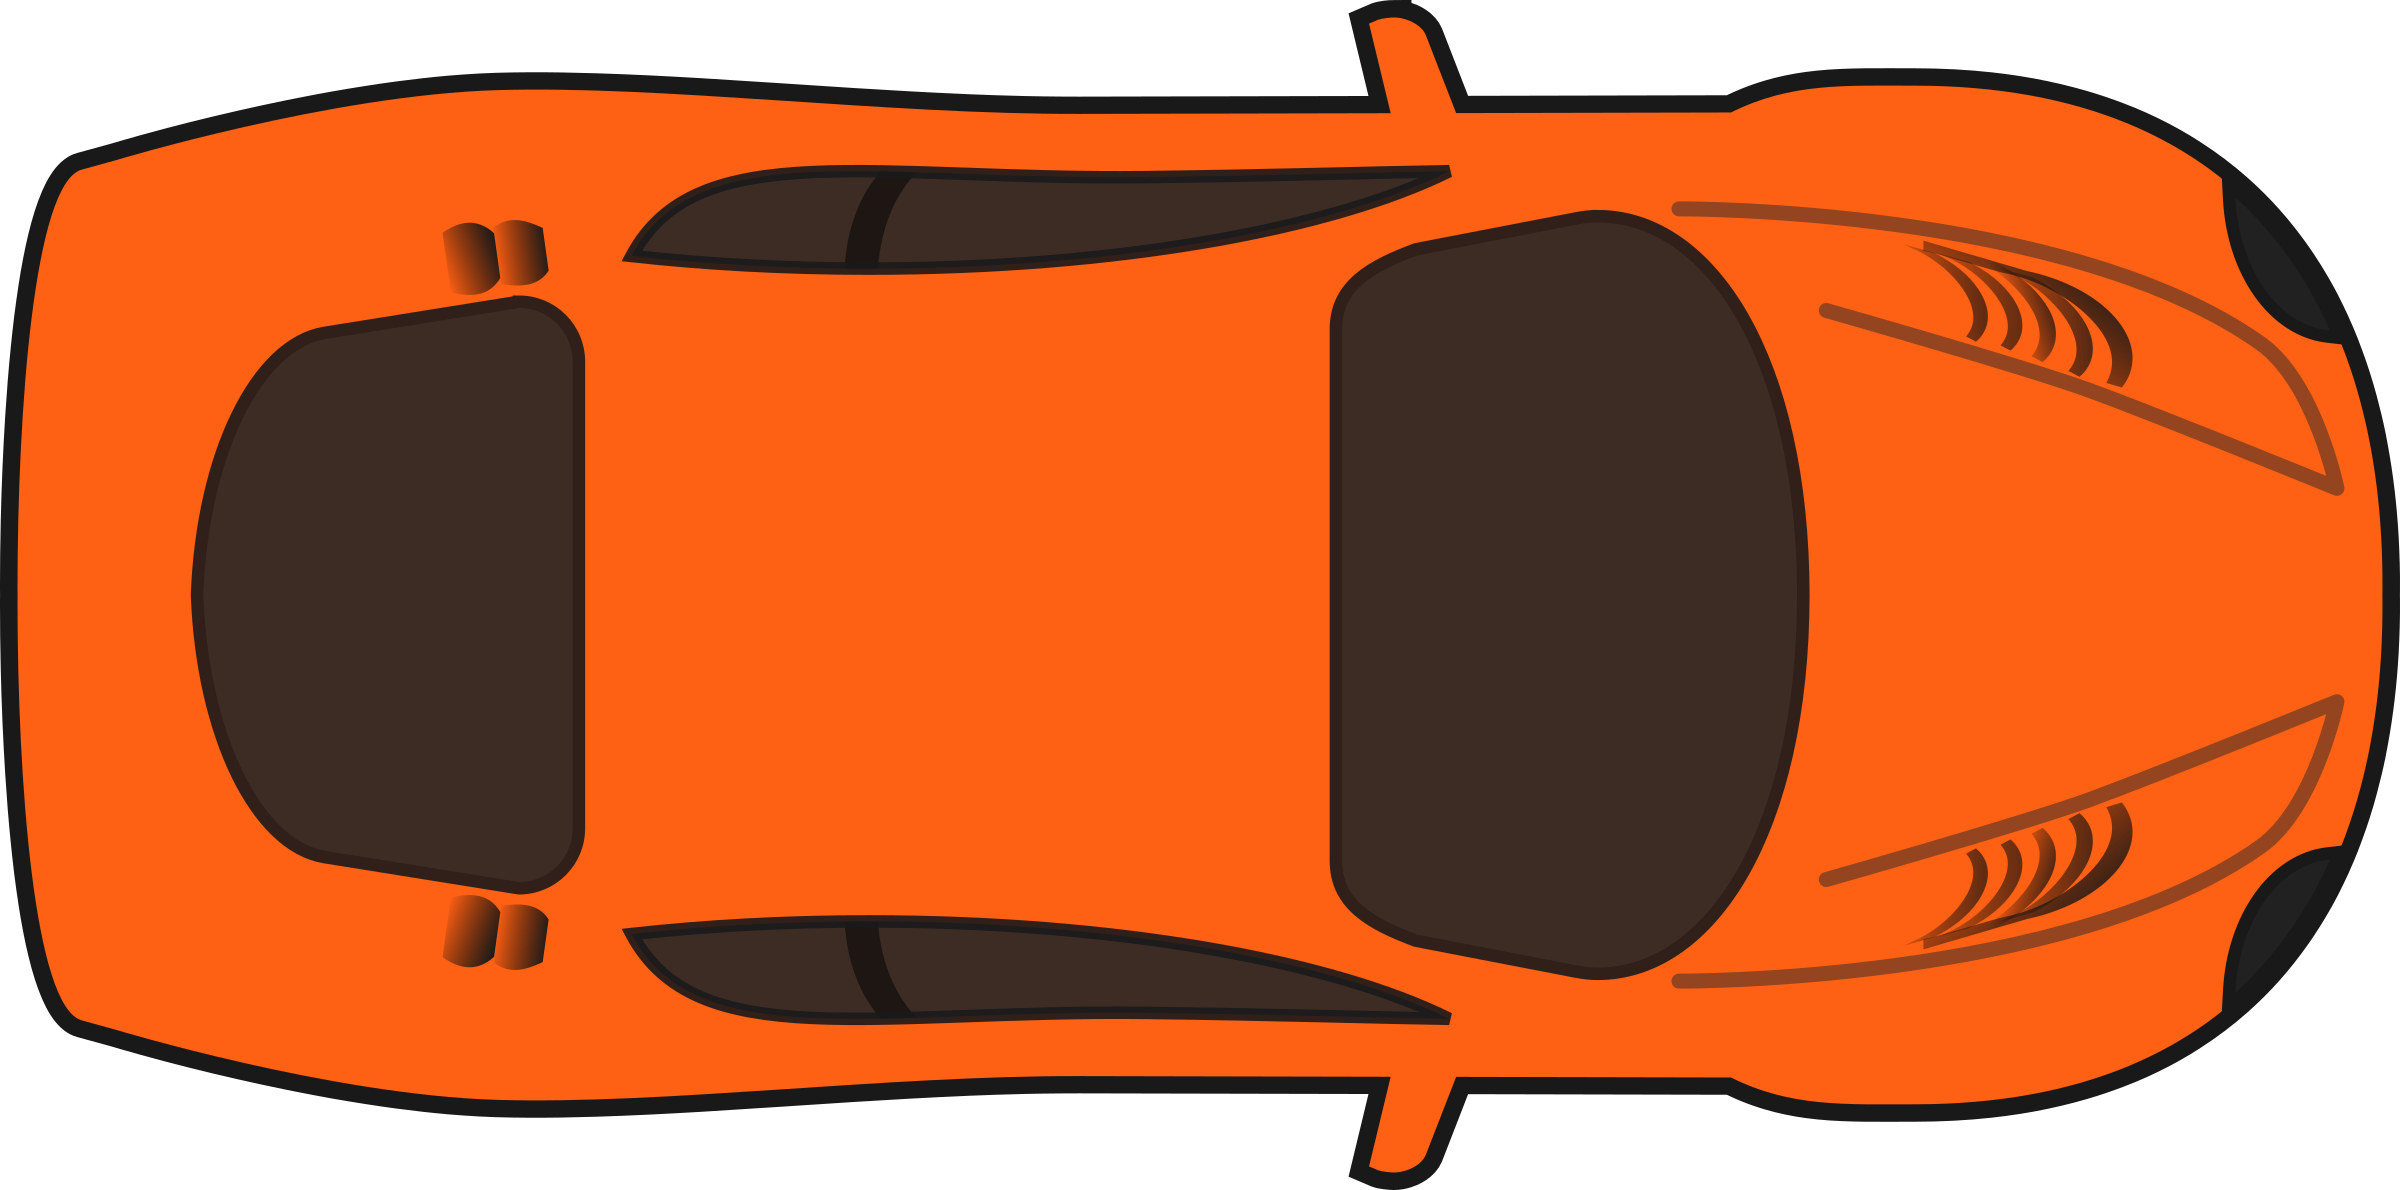 Orange Race Car Clip Art.